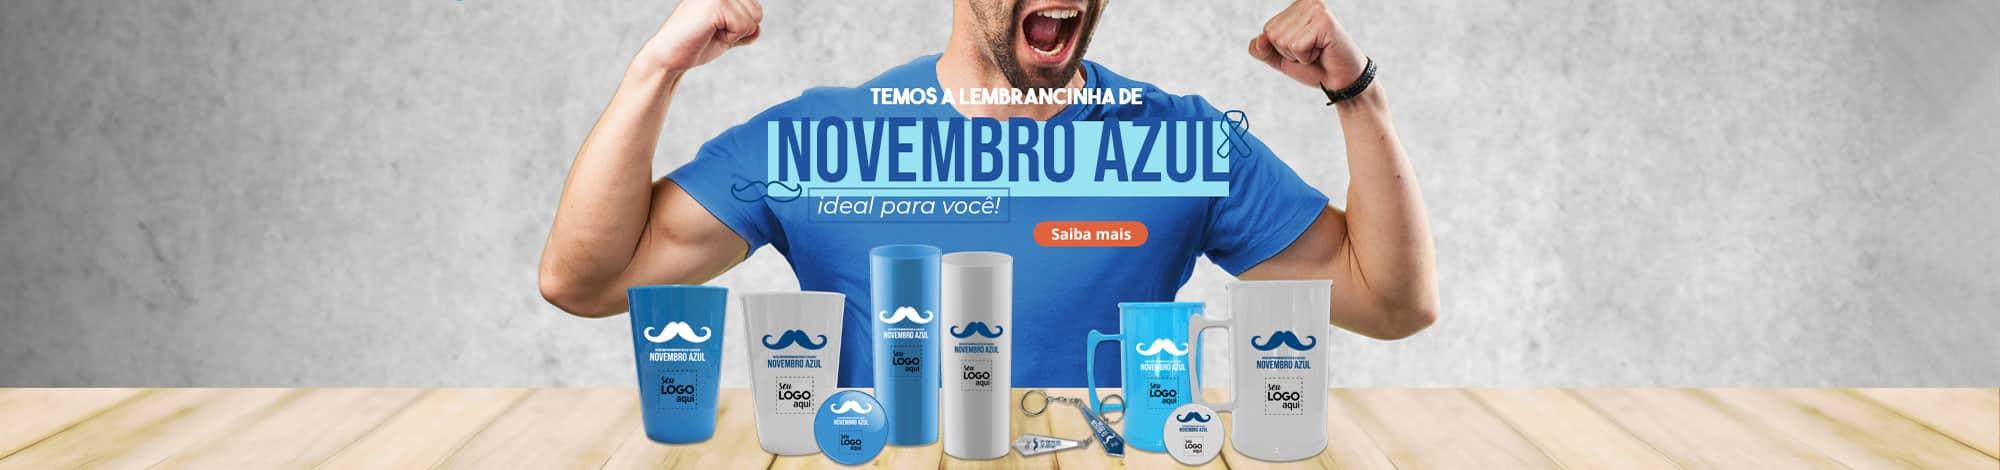 Lembrancinhas para Novembro Azul 2